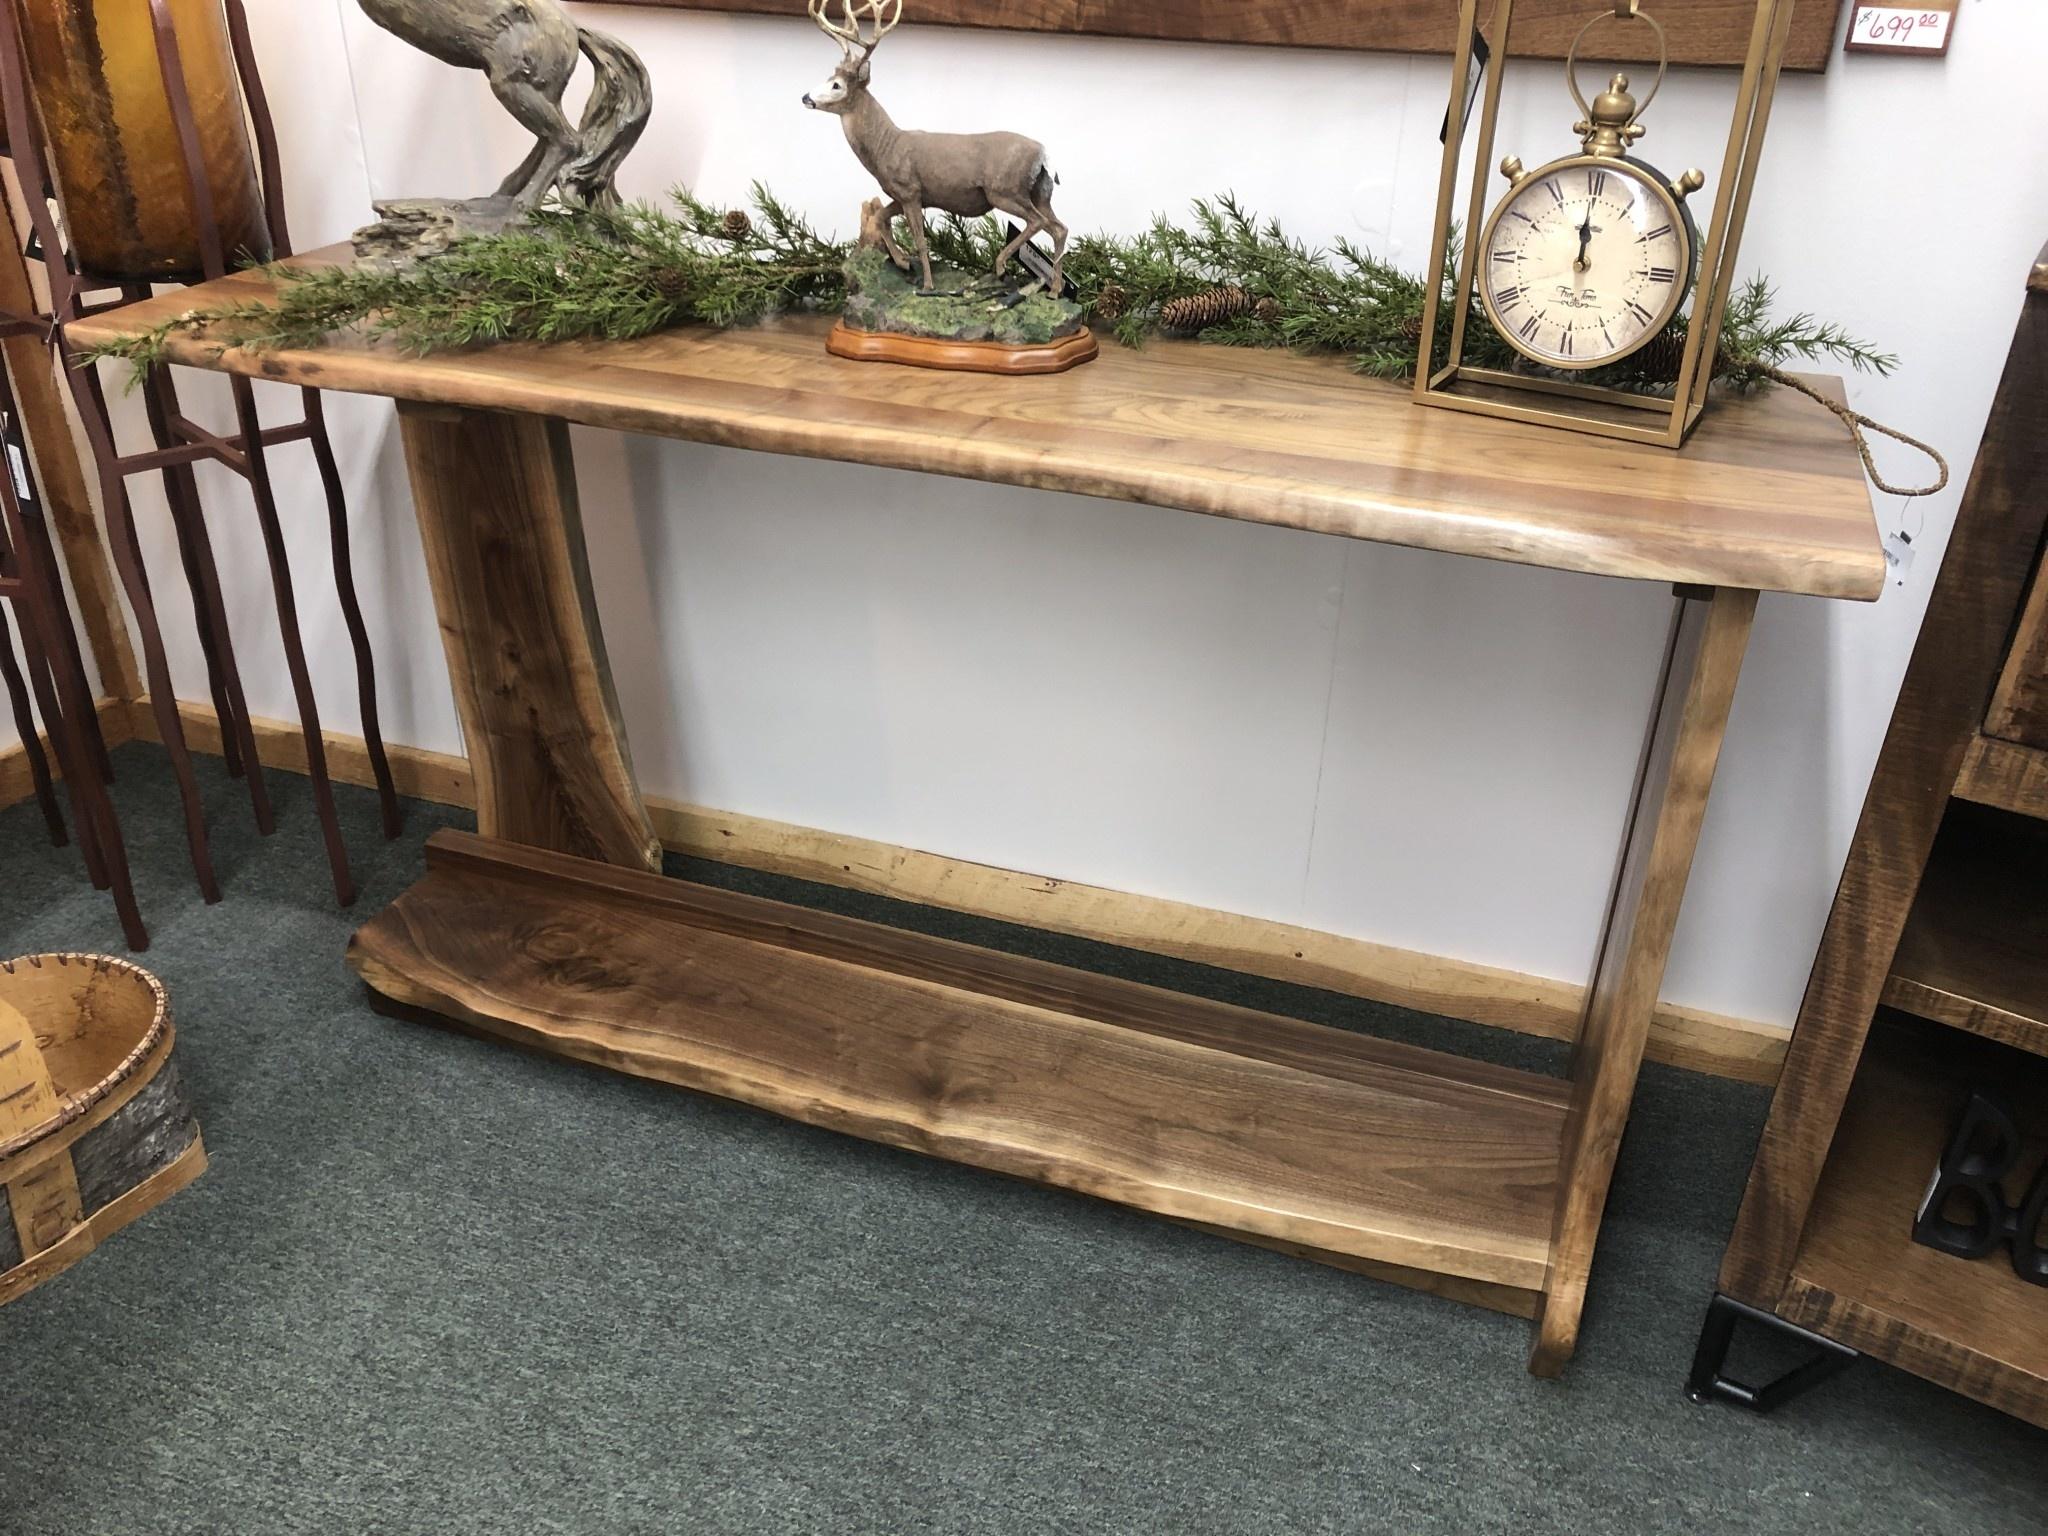 Green Gables Taos Sofa Table w/Shelf